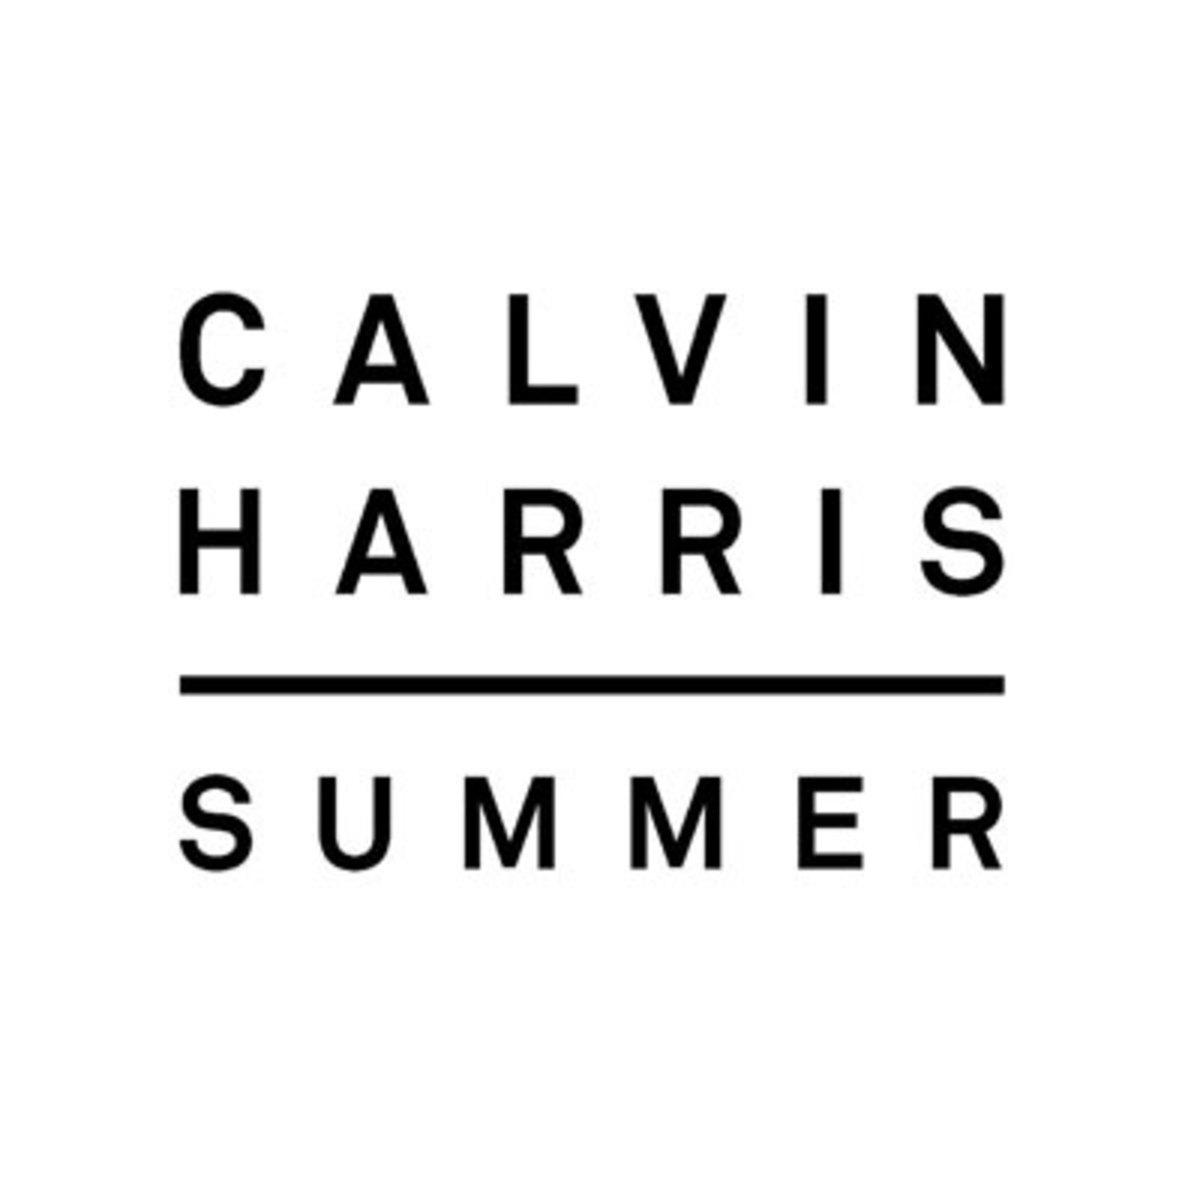 calvinharris-summer.jpg